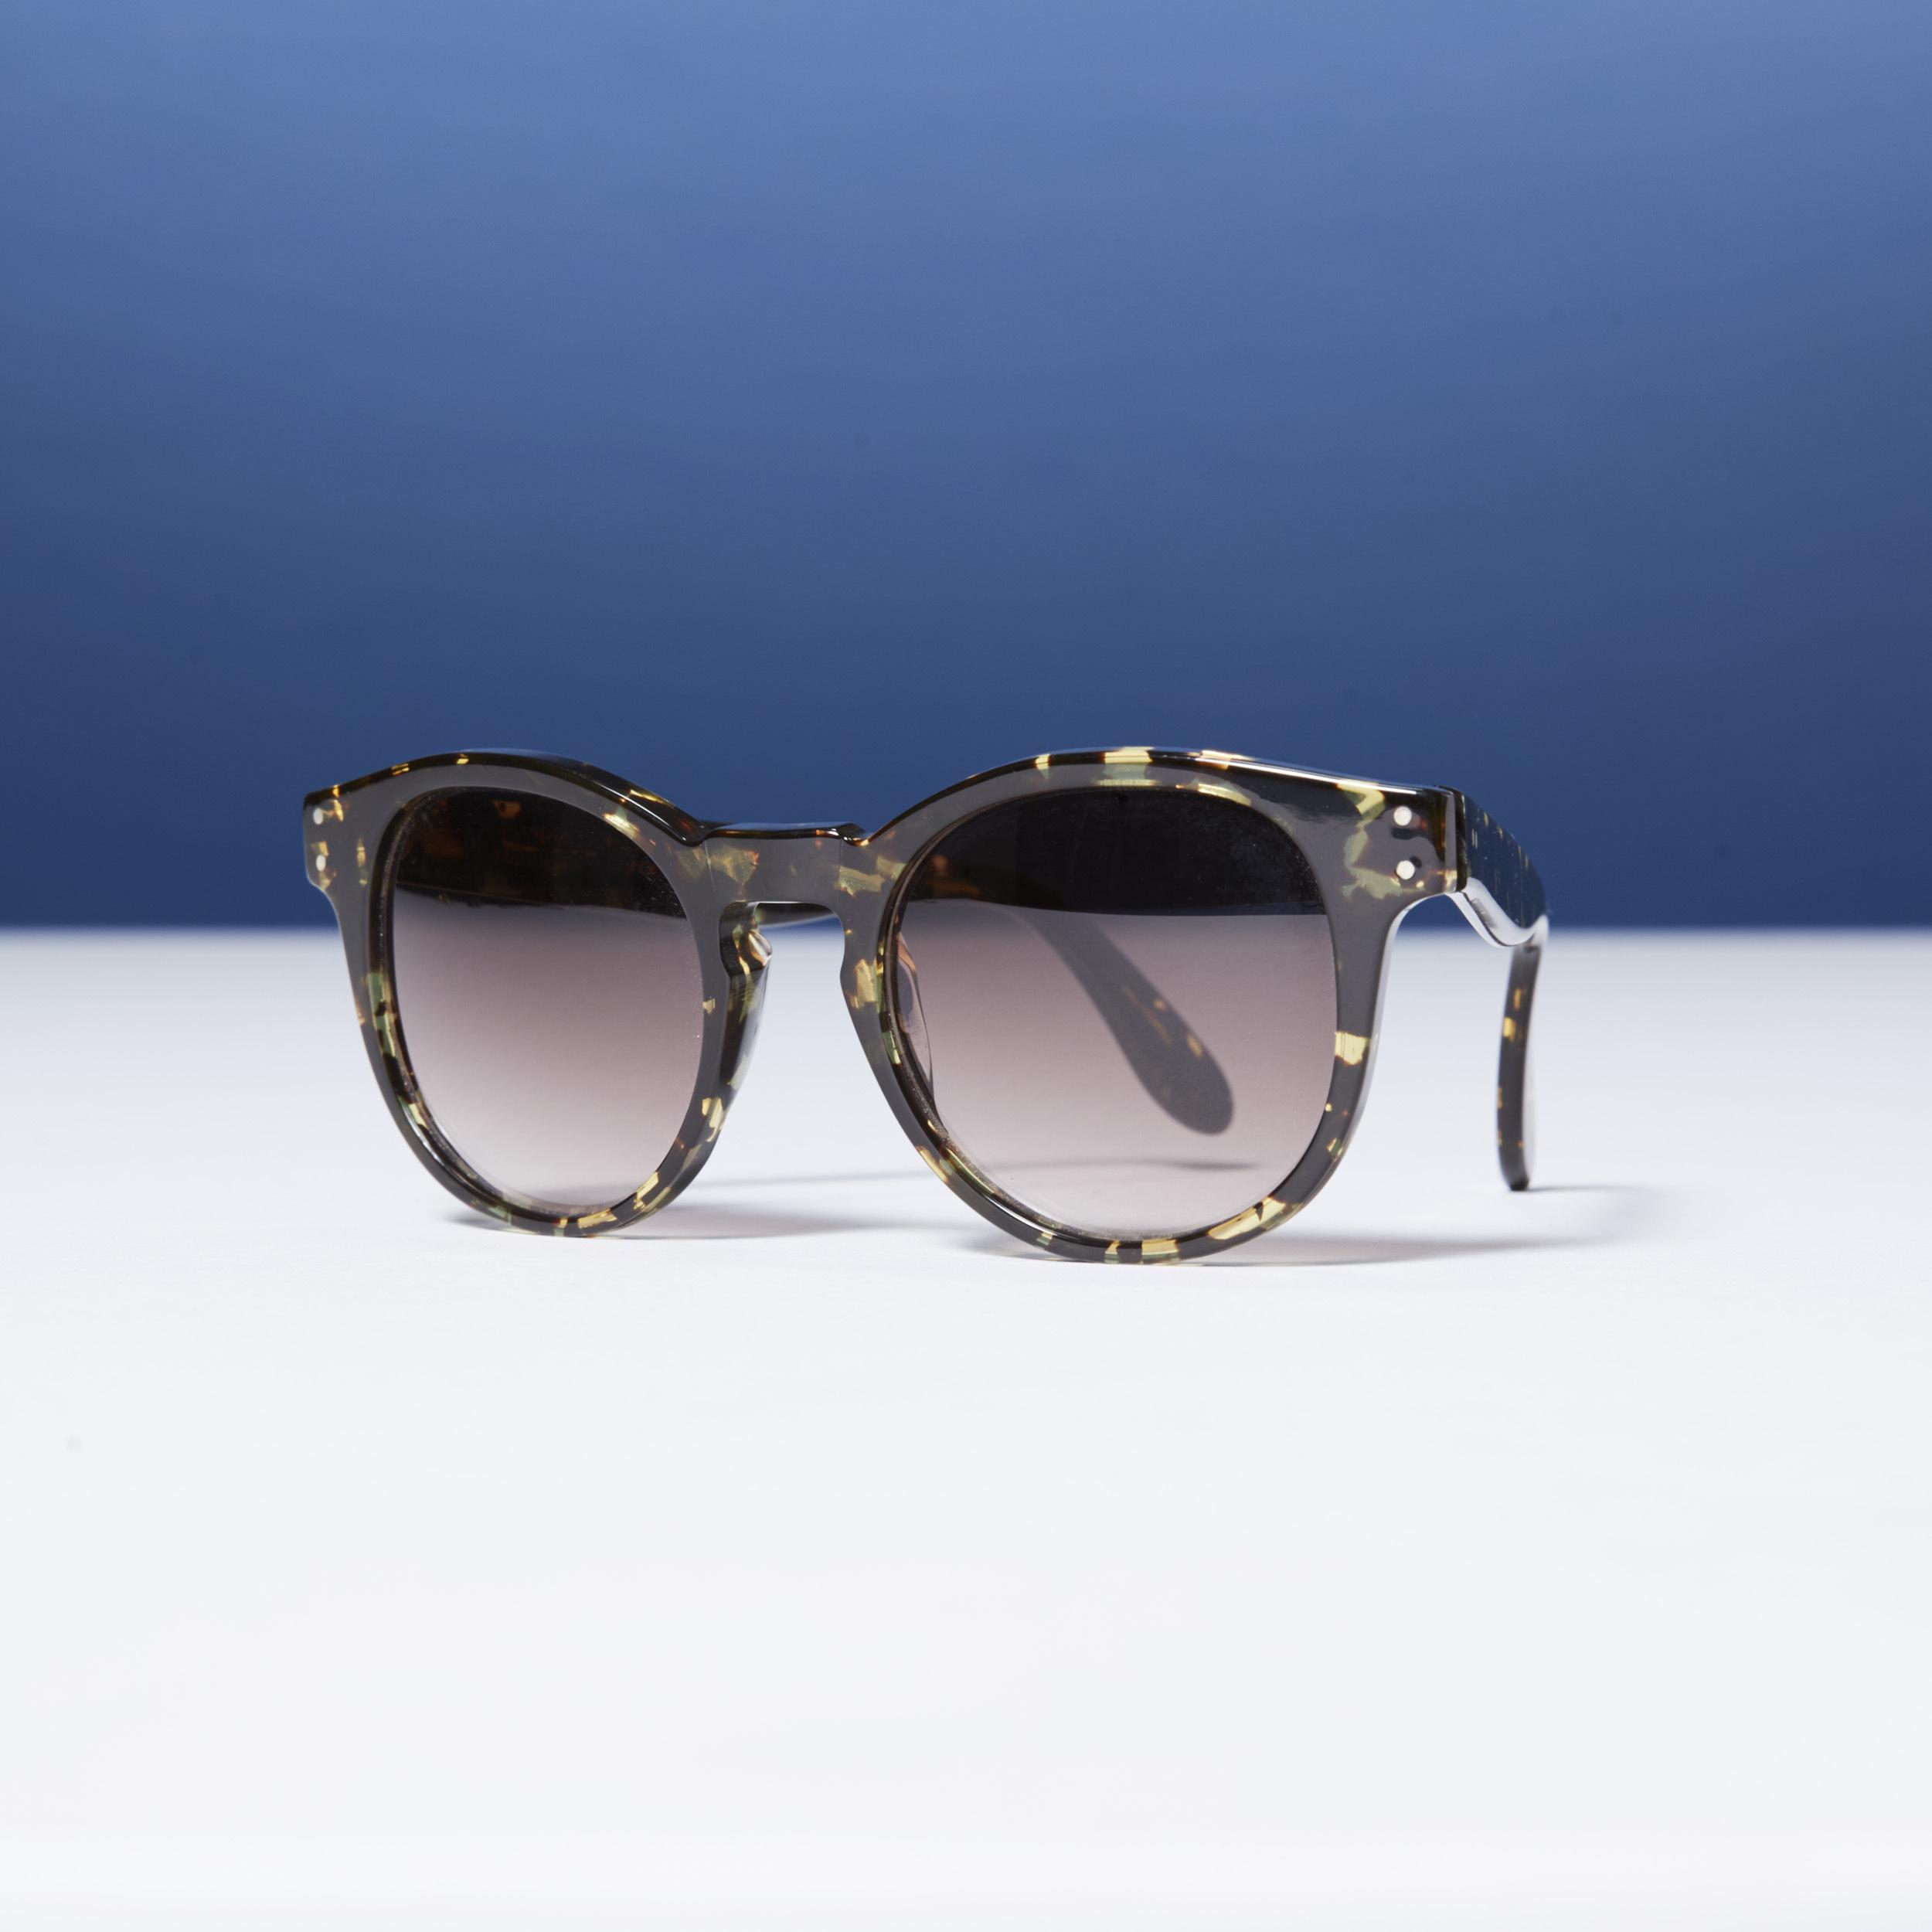 Wilde Sunglasses × BUENA VISTA